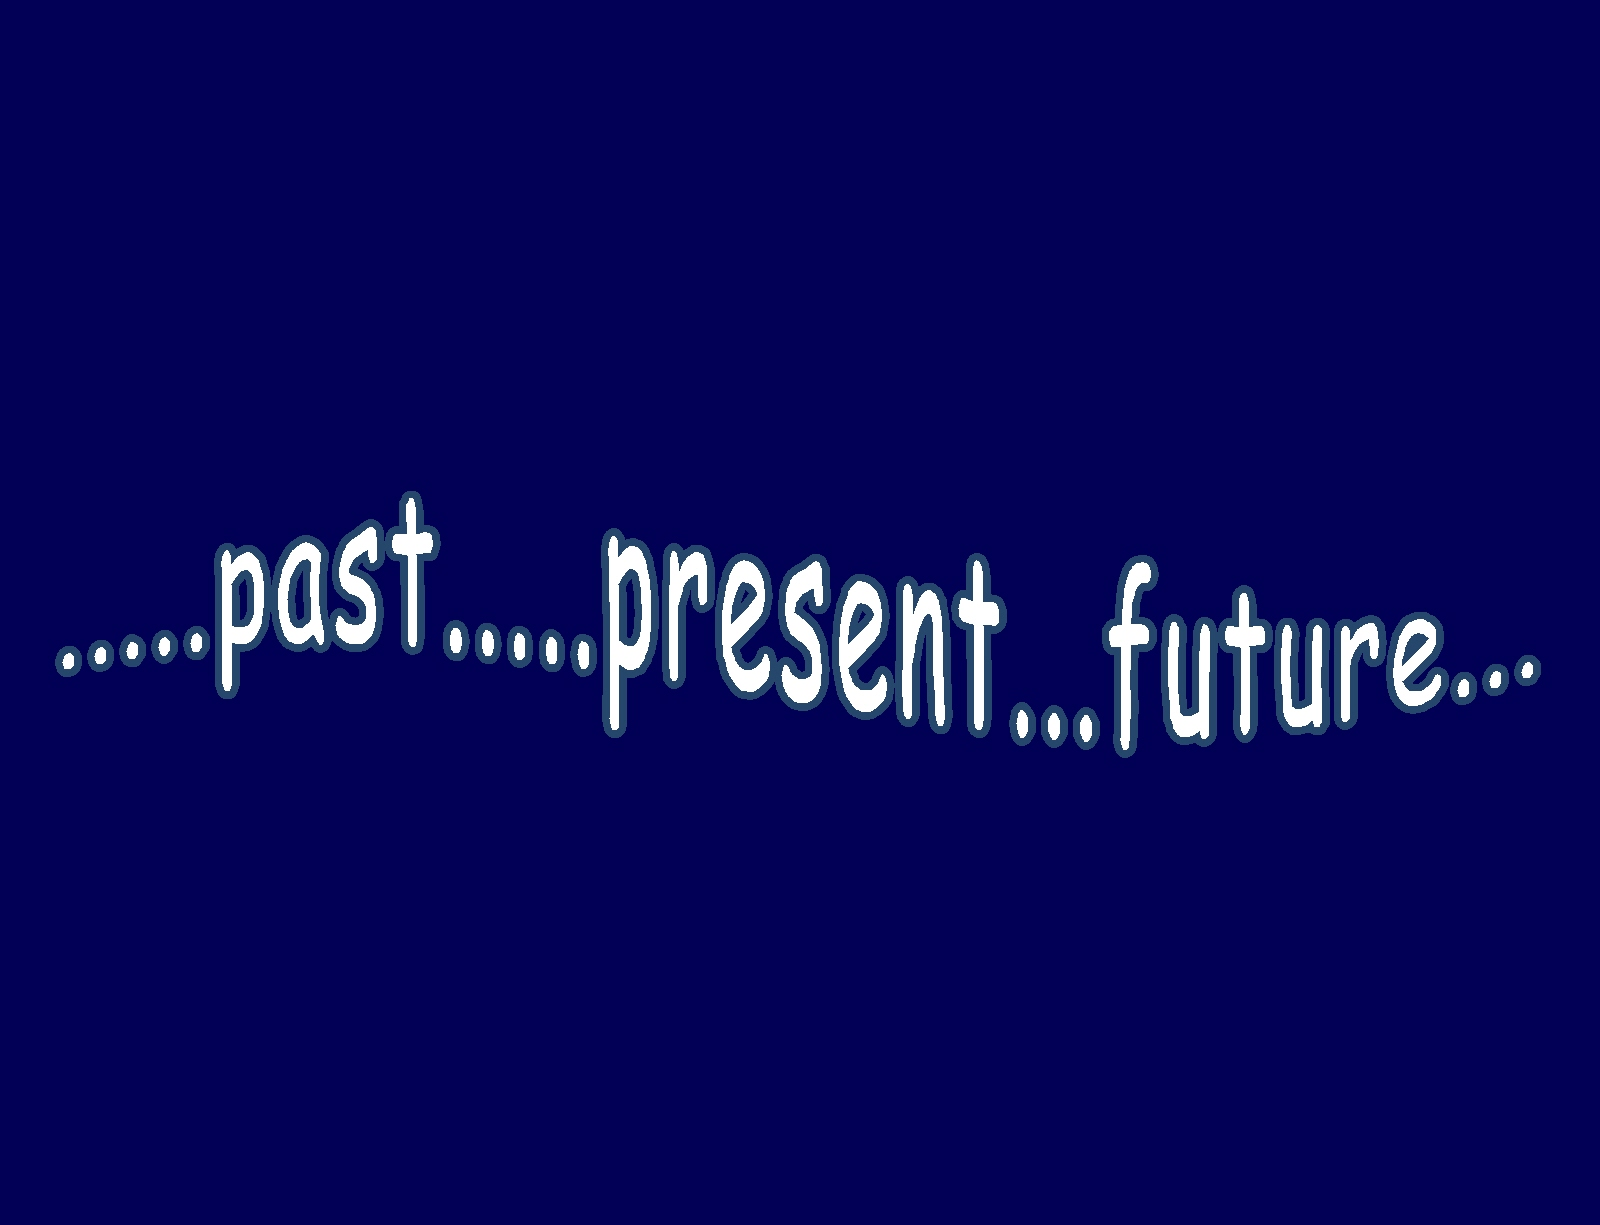 Past present future reflection